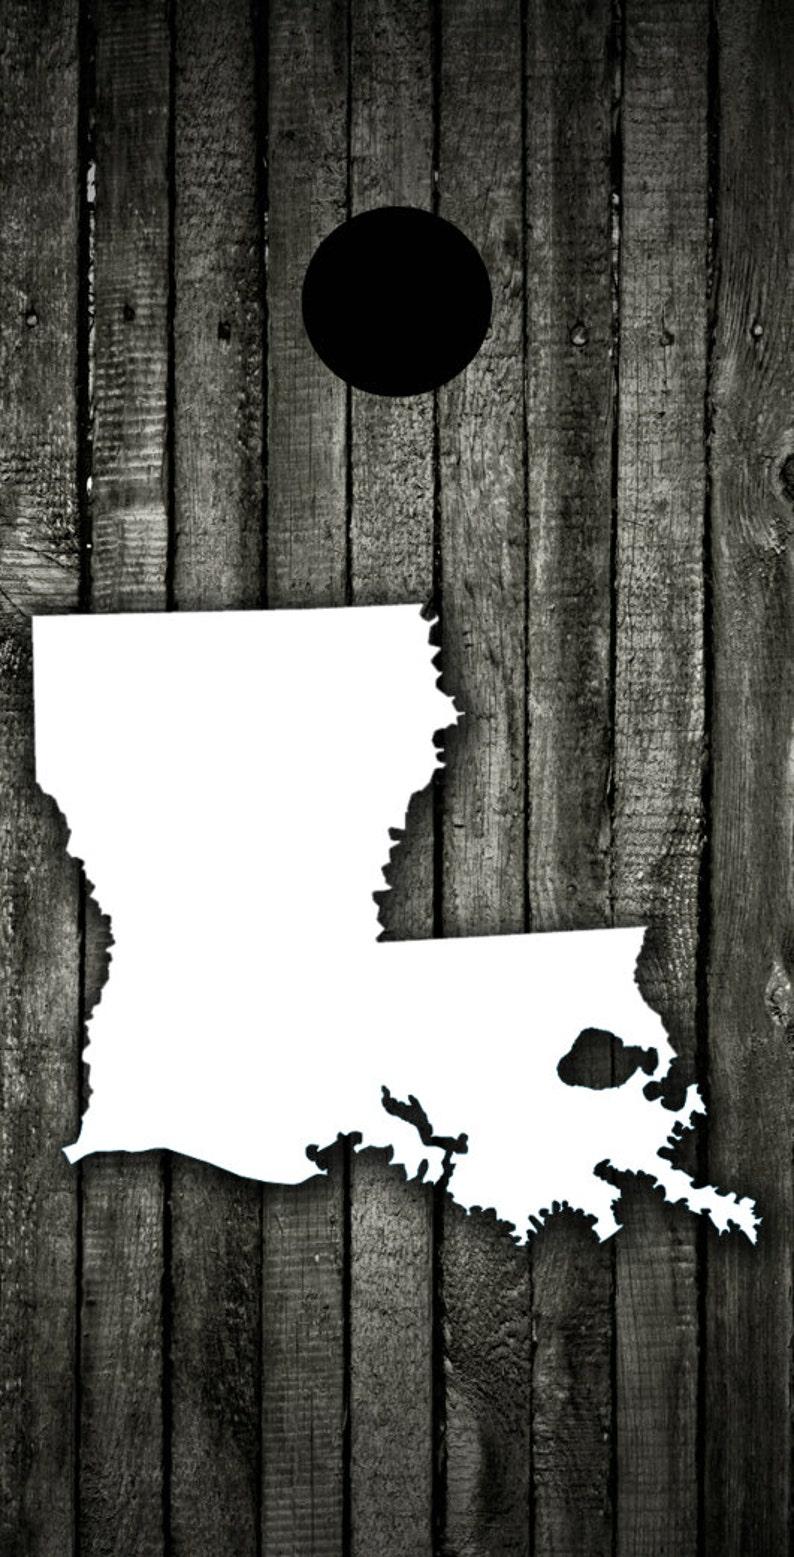 Corn Hole Bag Toss Regulation Size Custom Cornhole Board Game Set Wood Louisiana Themed Light Weight 1x4